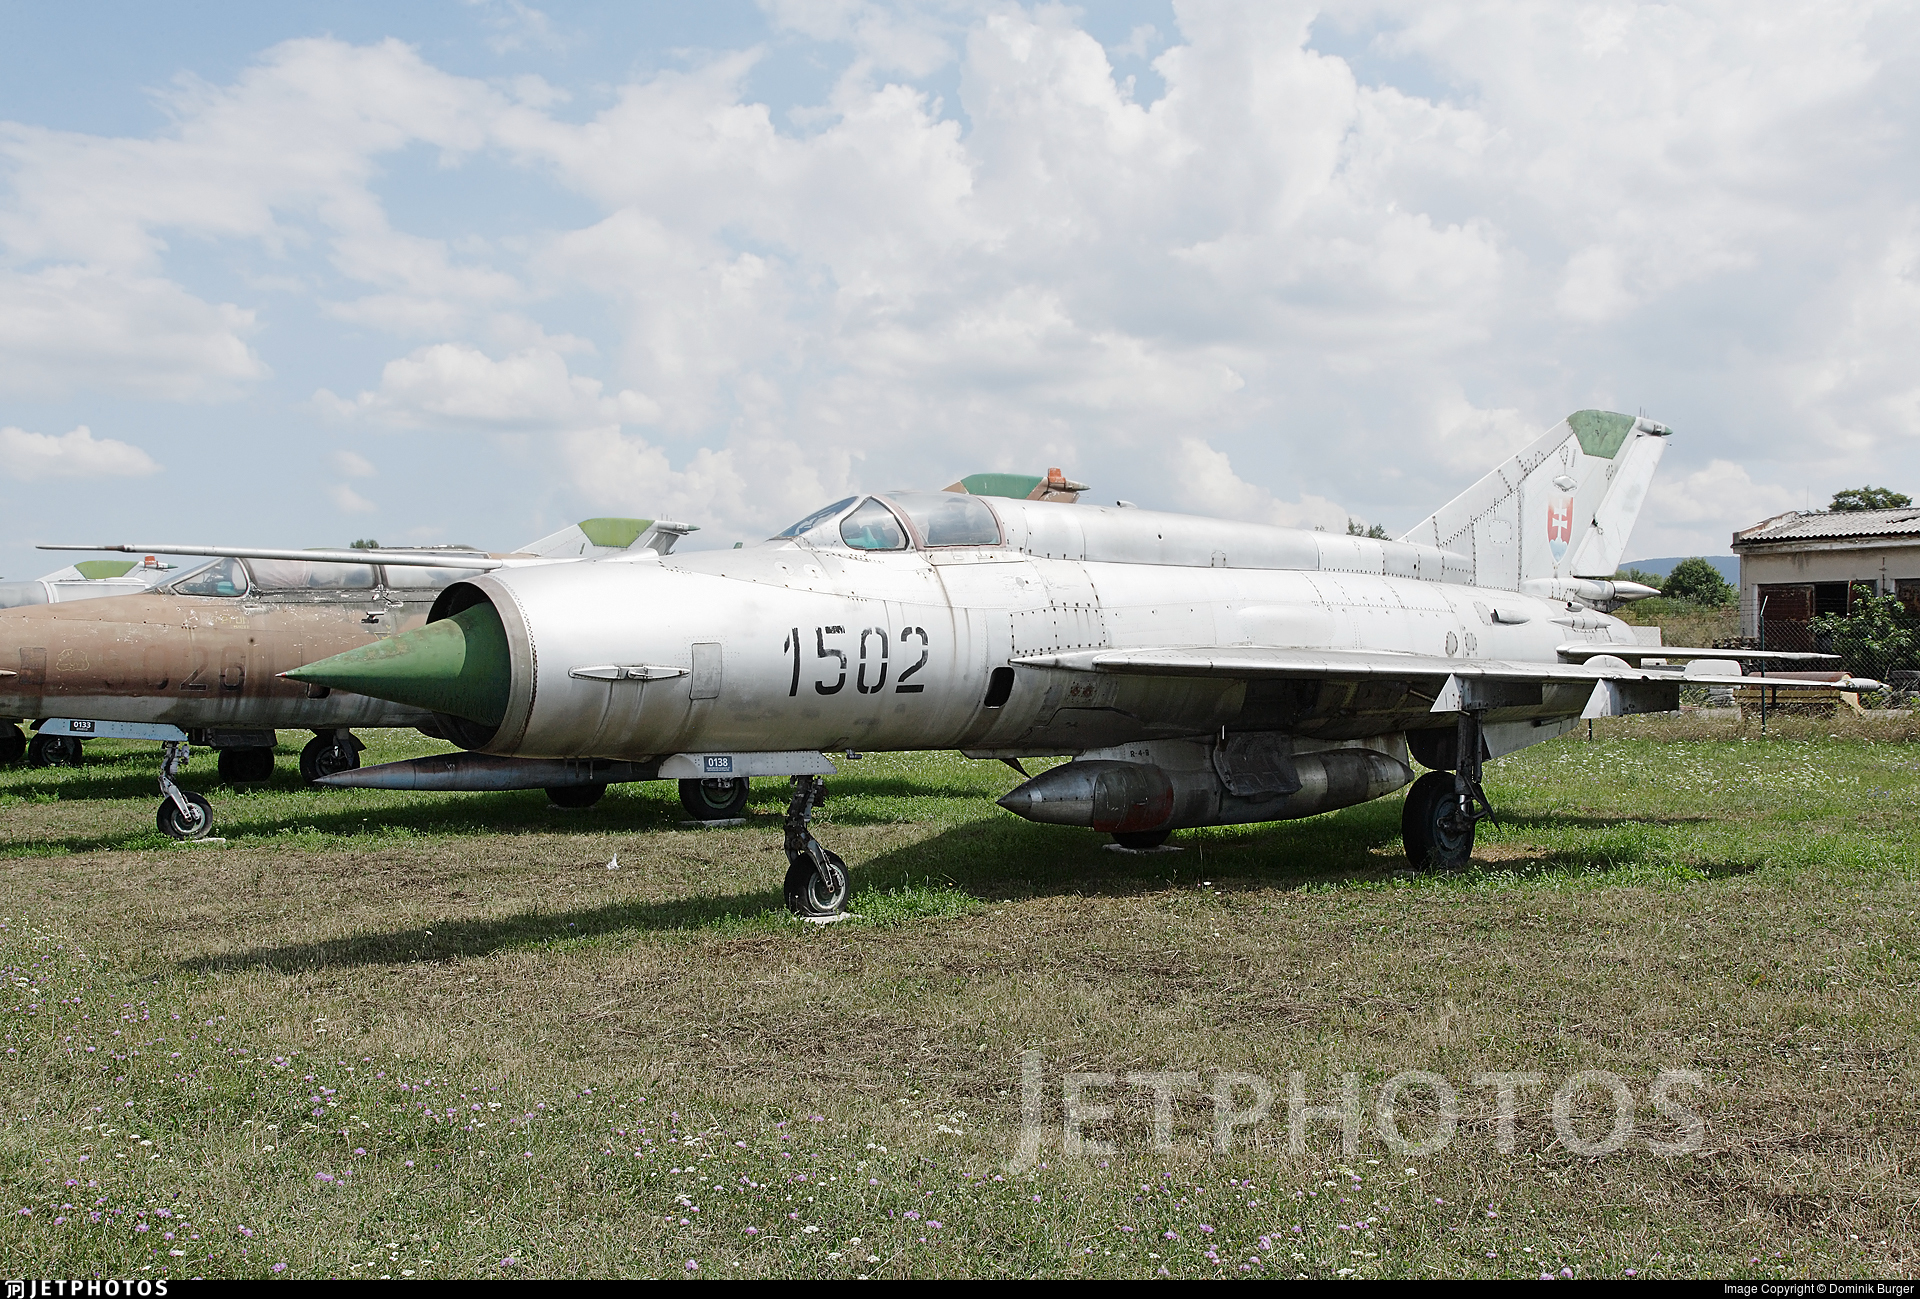 1502 - Mikoyan-Gurevich MiG-21R Fishbed H - Slovakia - Air Force